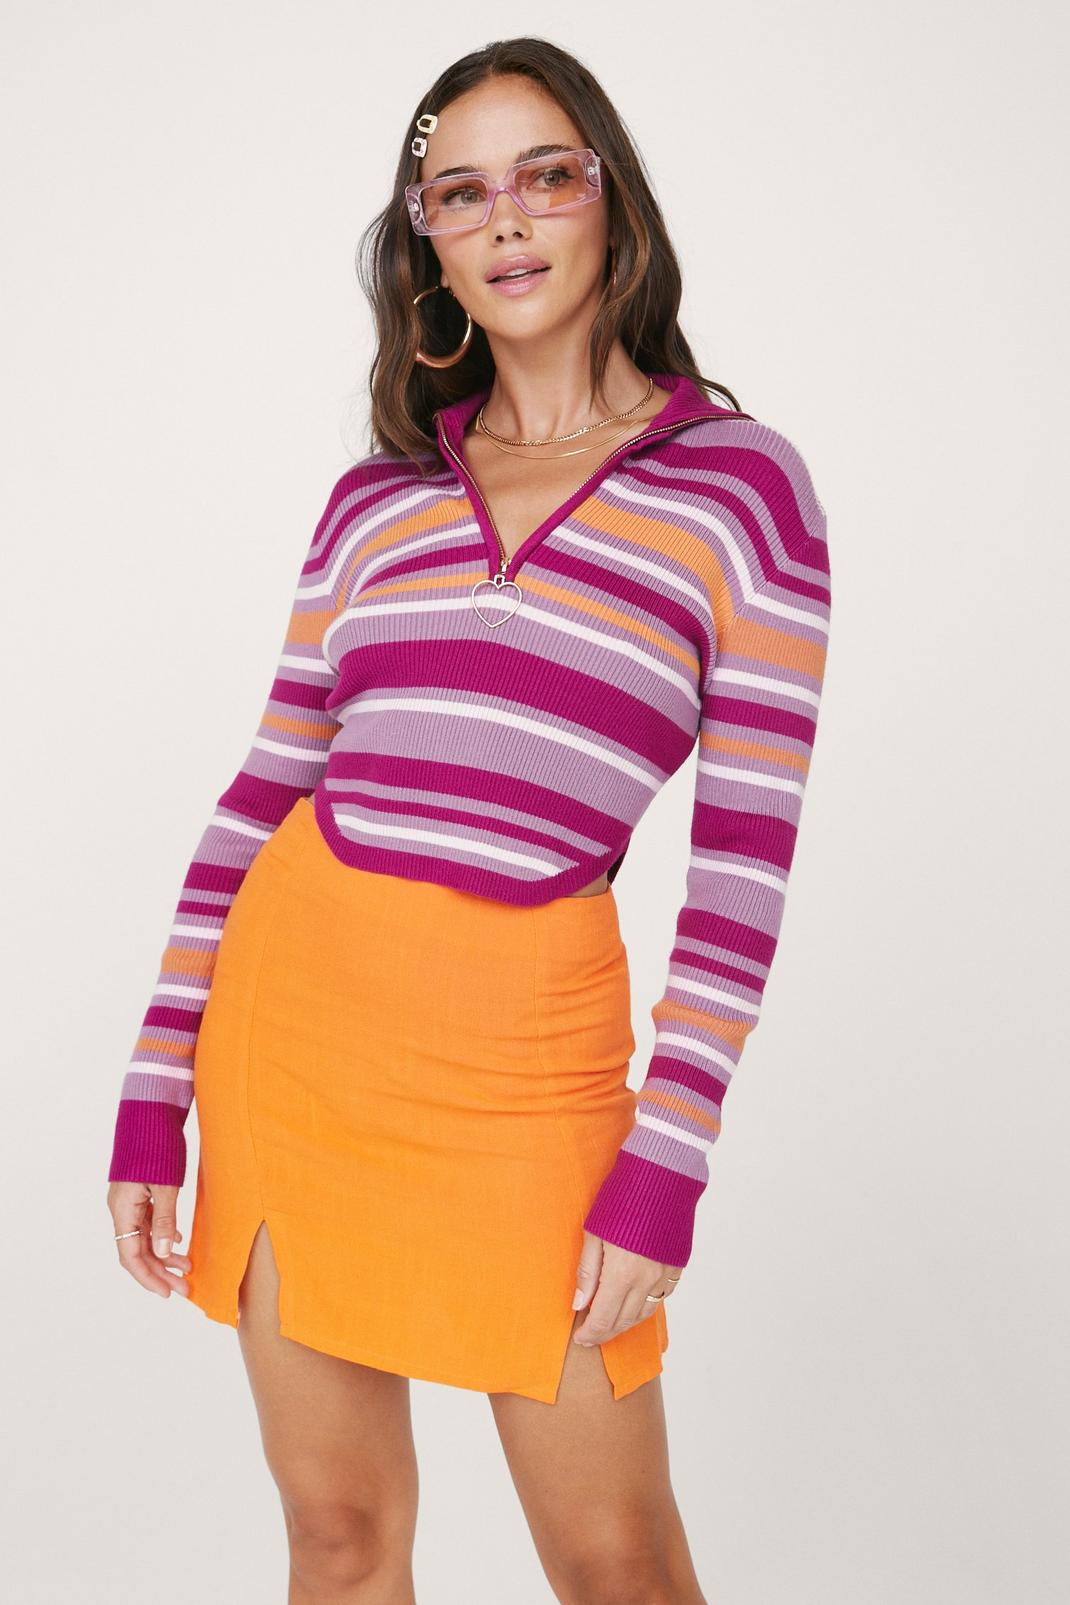 Long Sleeve Striped Cropped Heart Zip Sweater